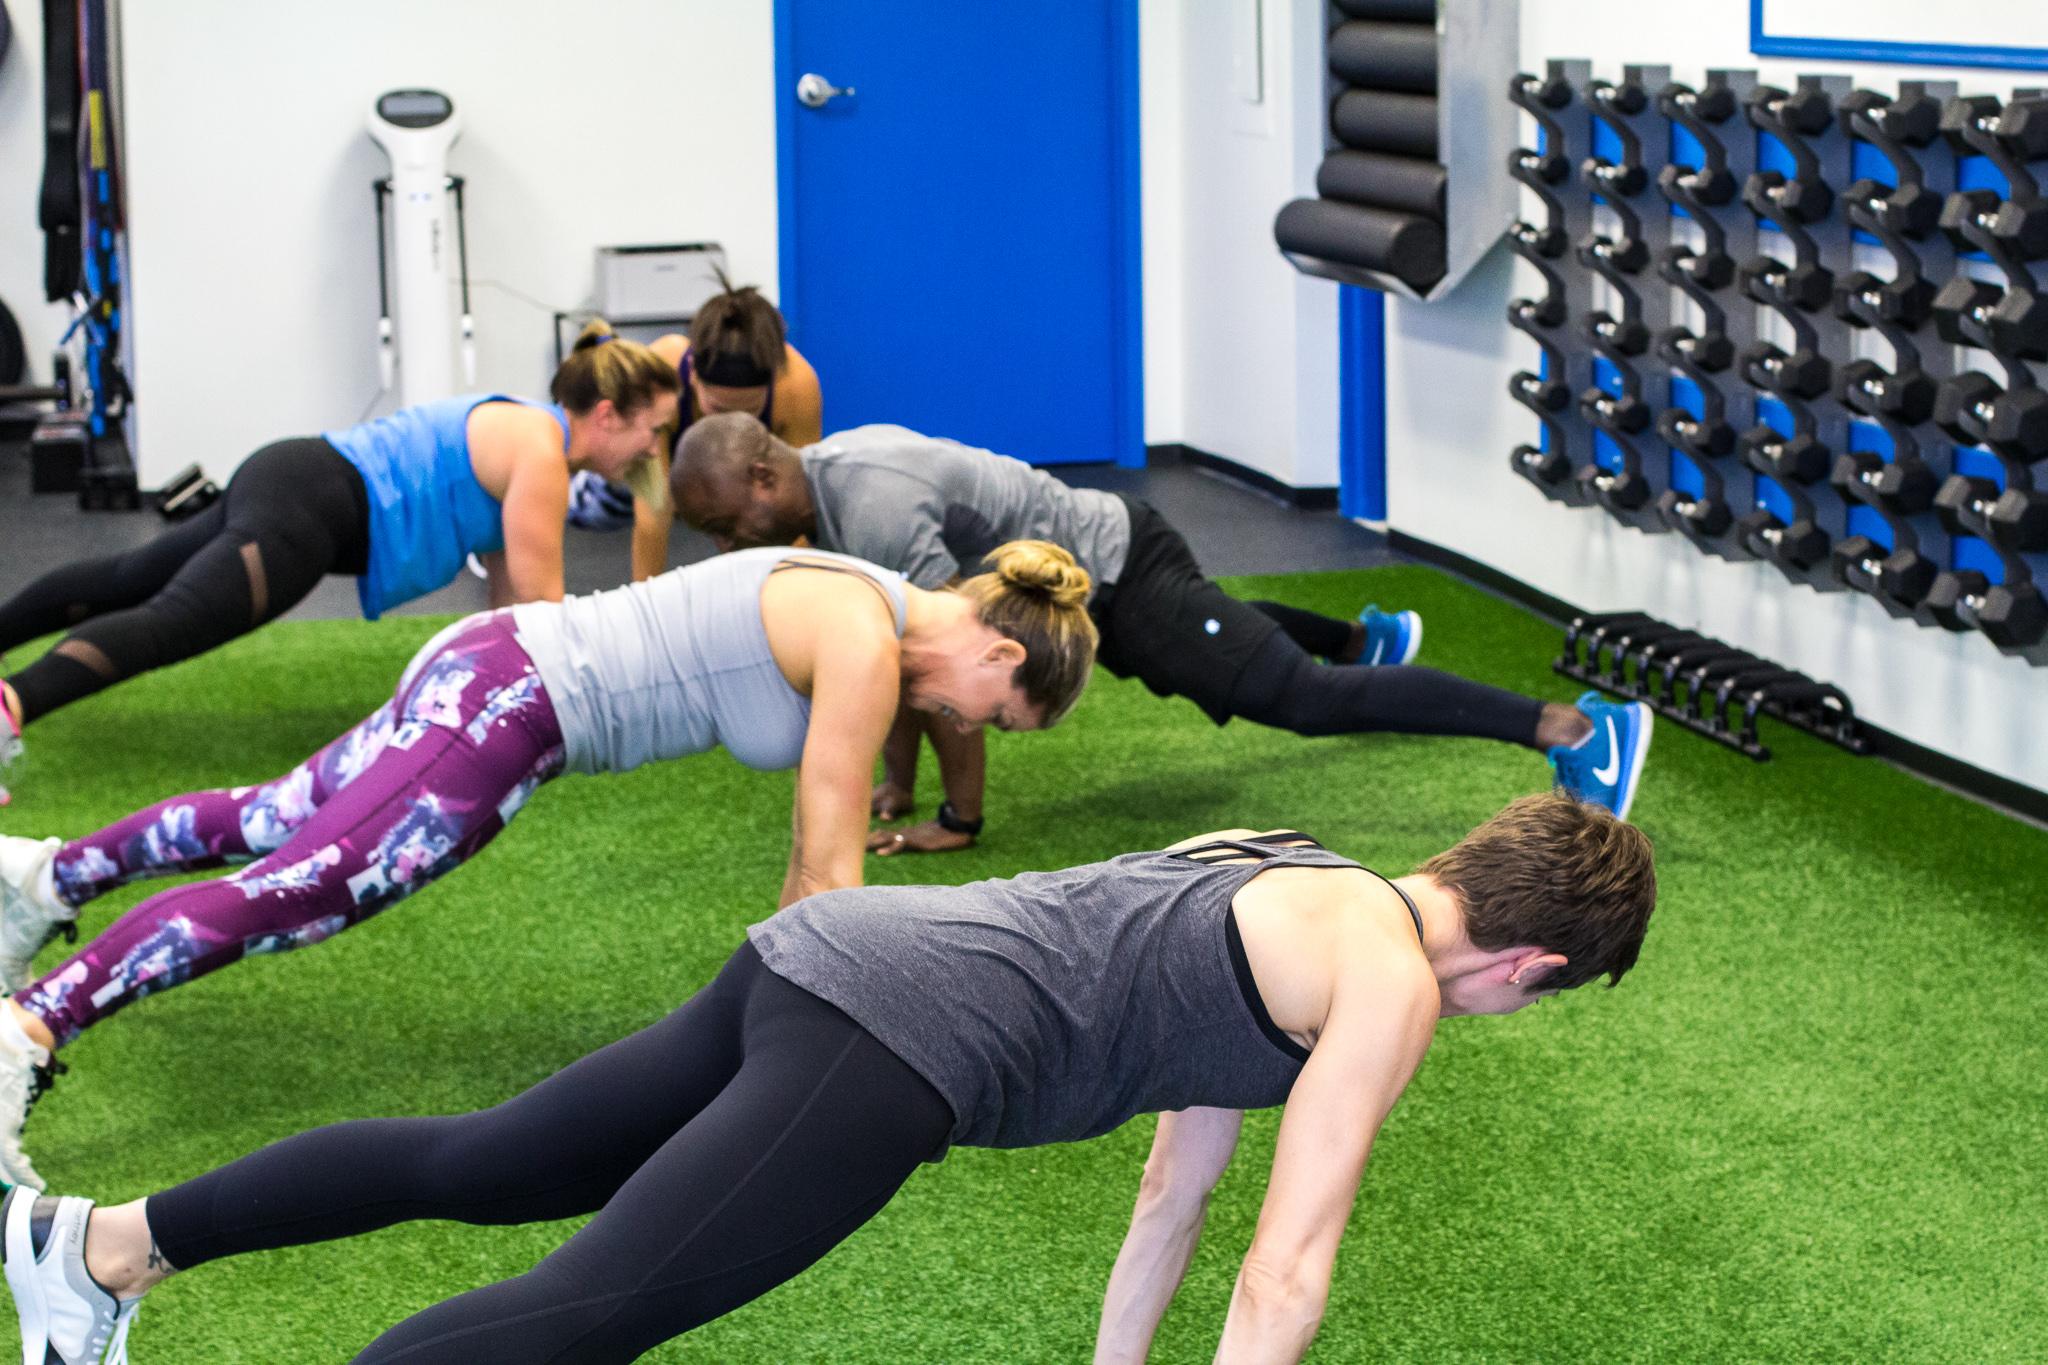 Awesome Group Motivation - Team Training